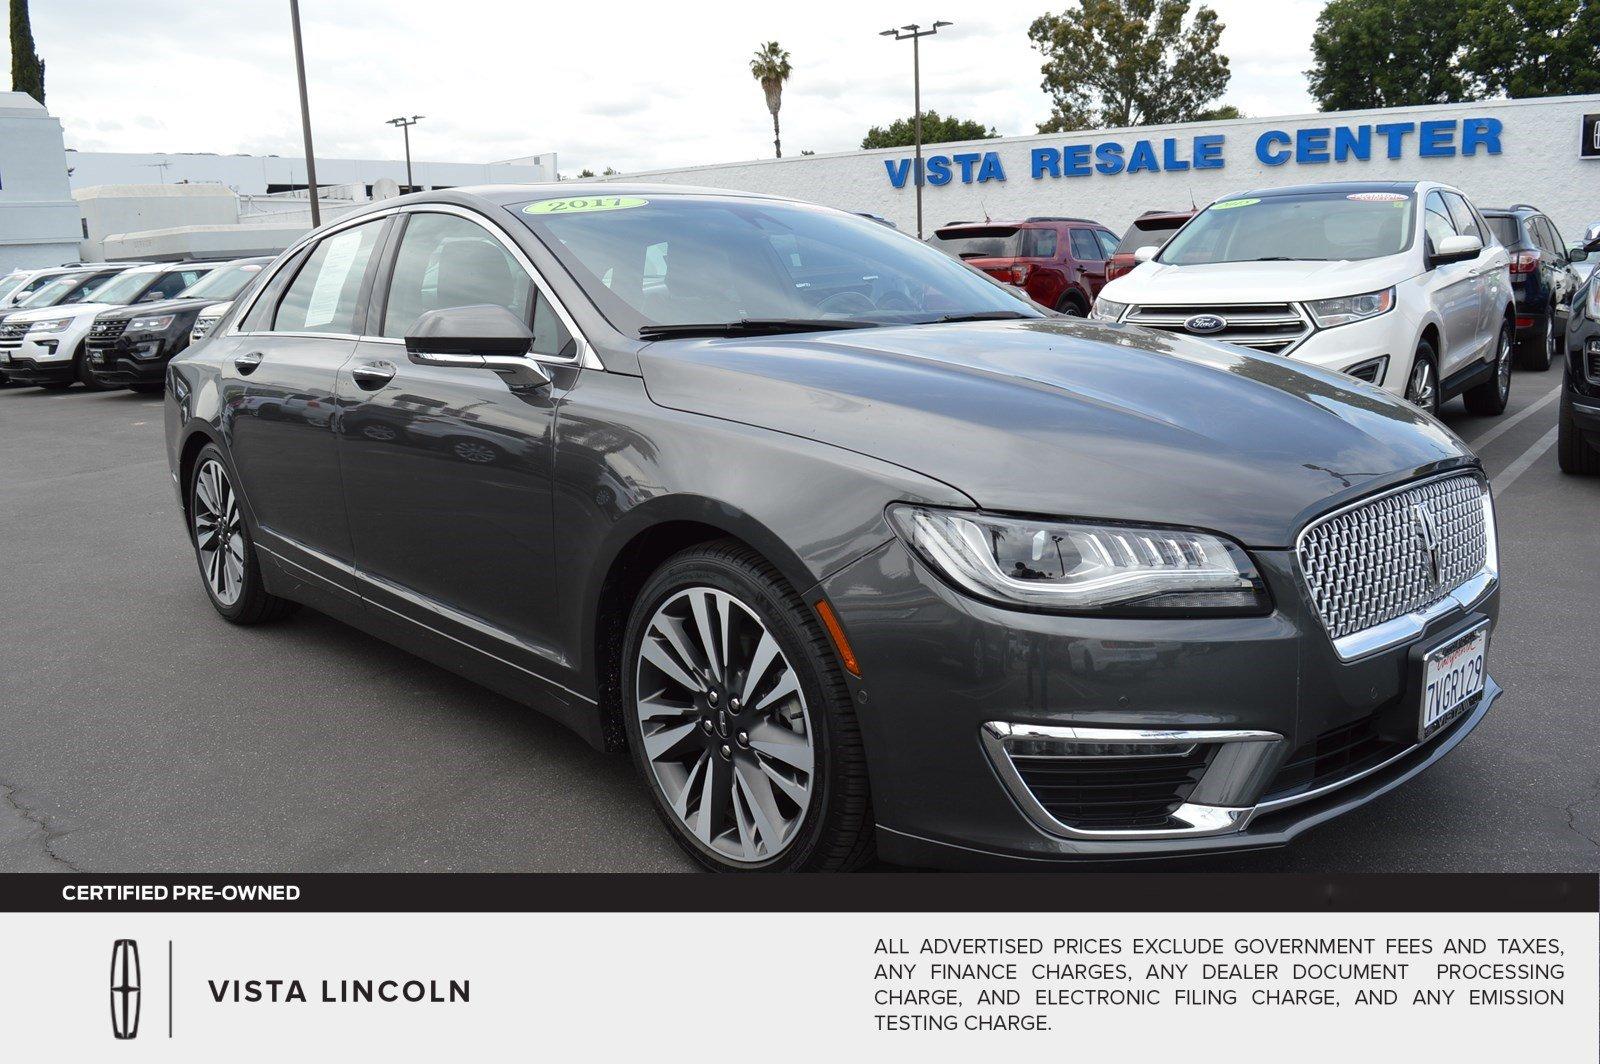 2017 Lincoln MKZ Hybrid Hybrid Select Sedan